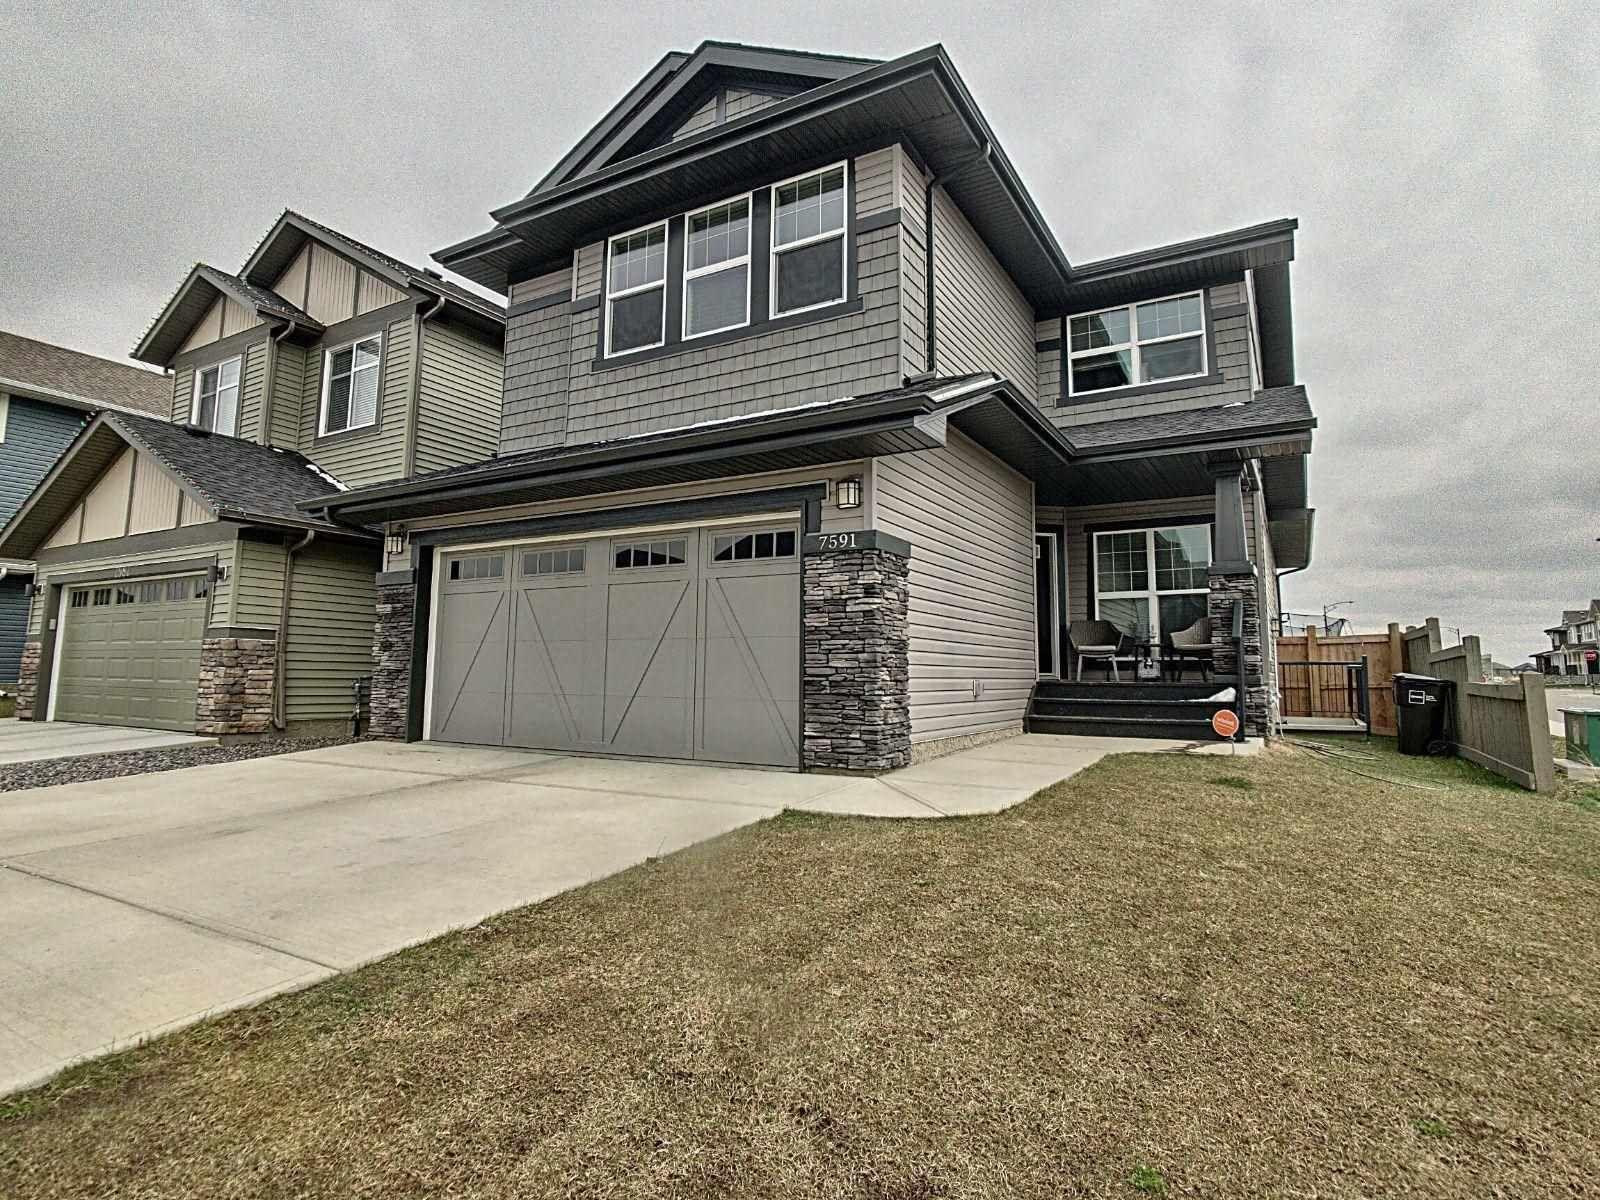 Main Photo: 7591 176 Avenue in Edmonton: Zone 28 House for sale : MLS®# E4245900